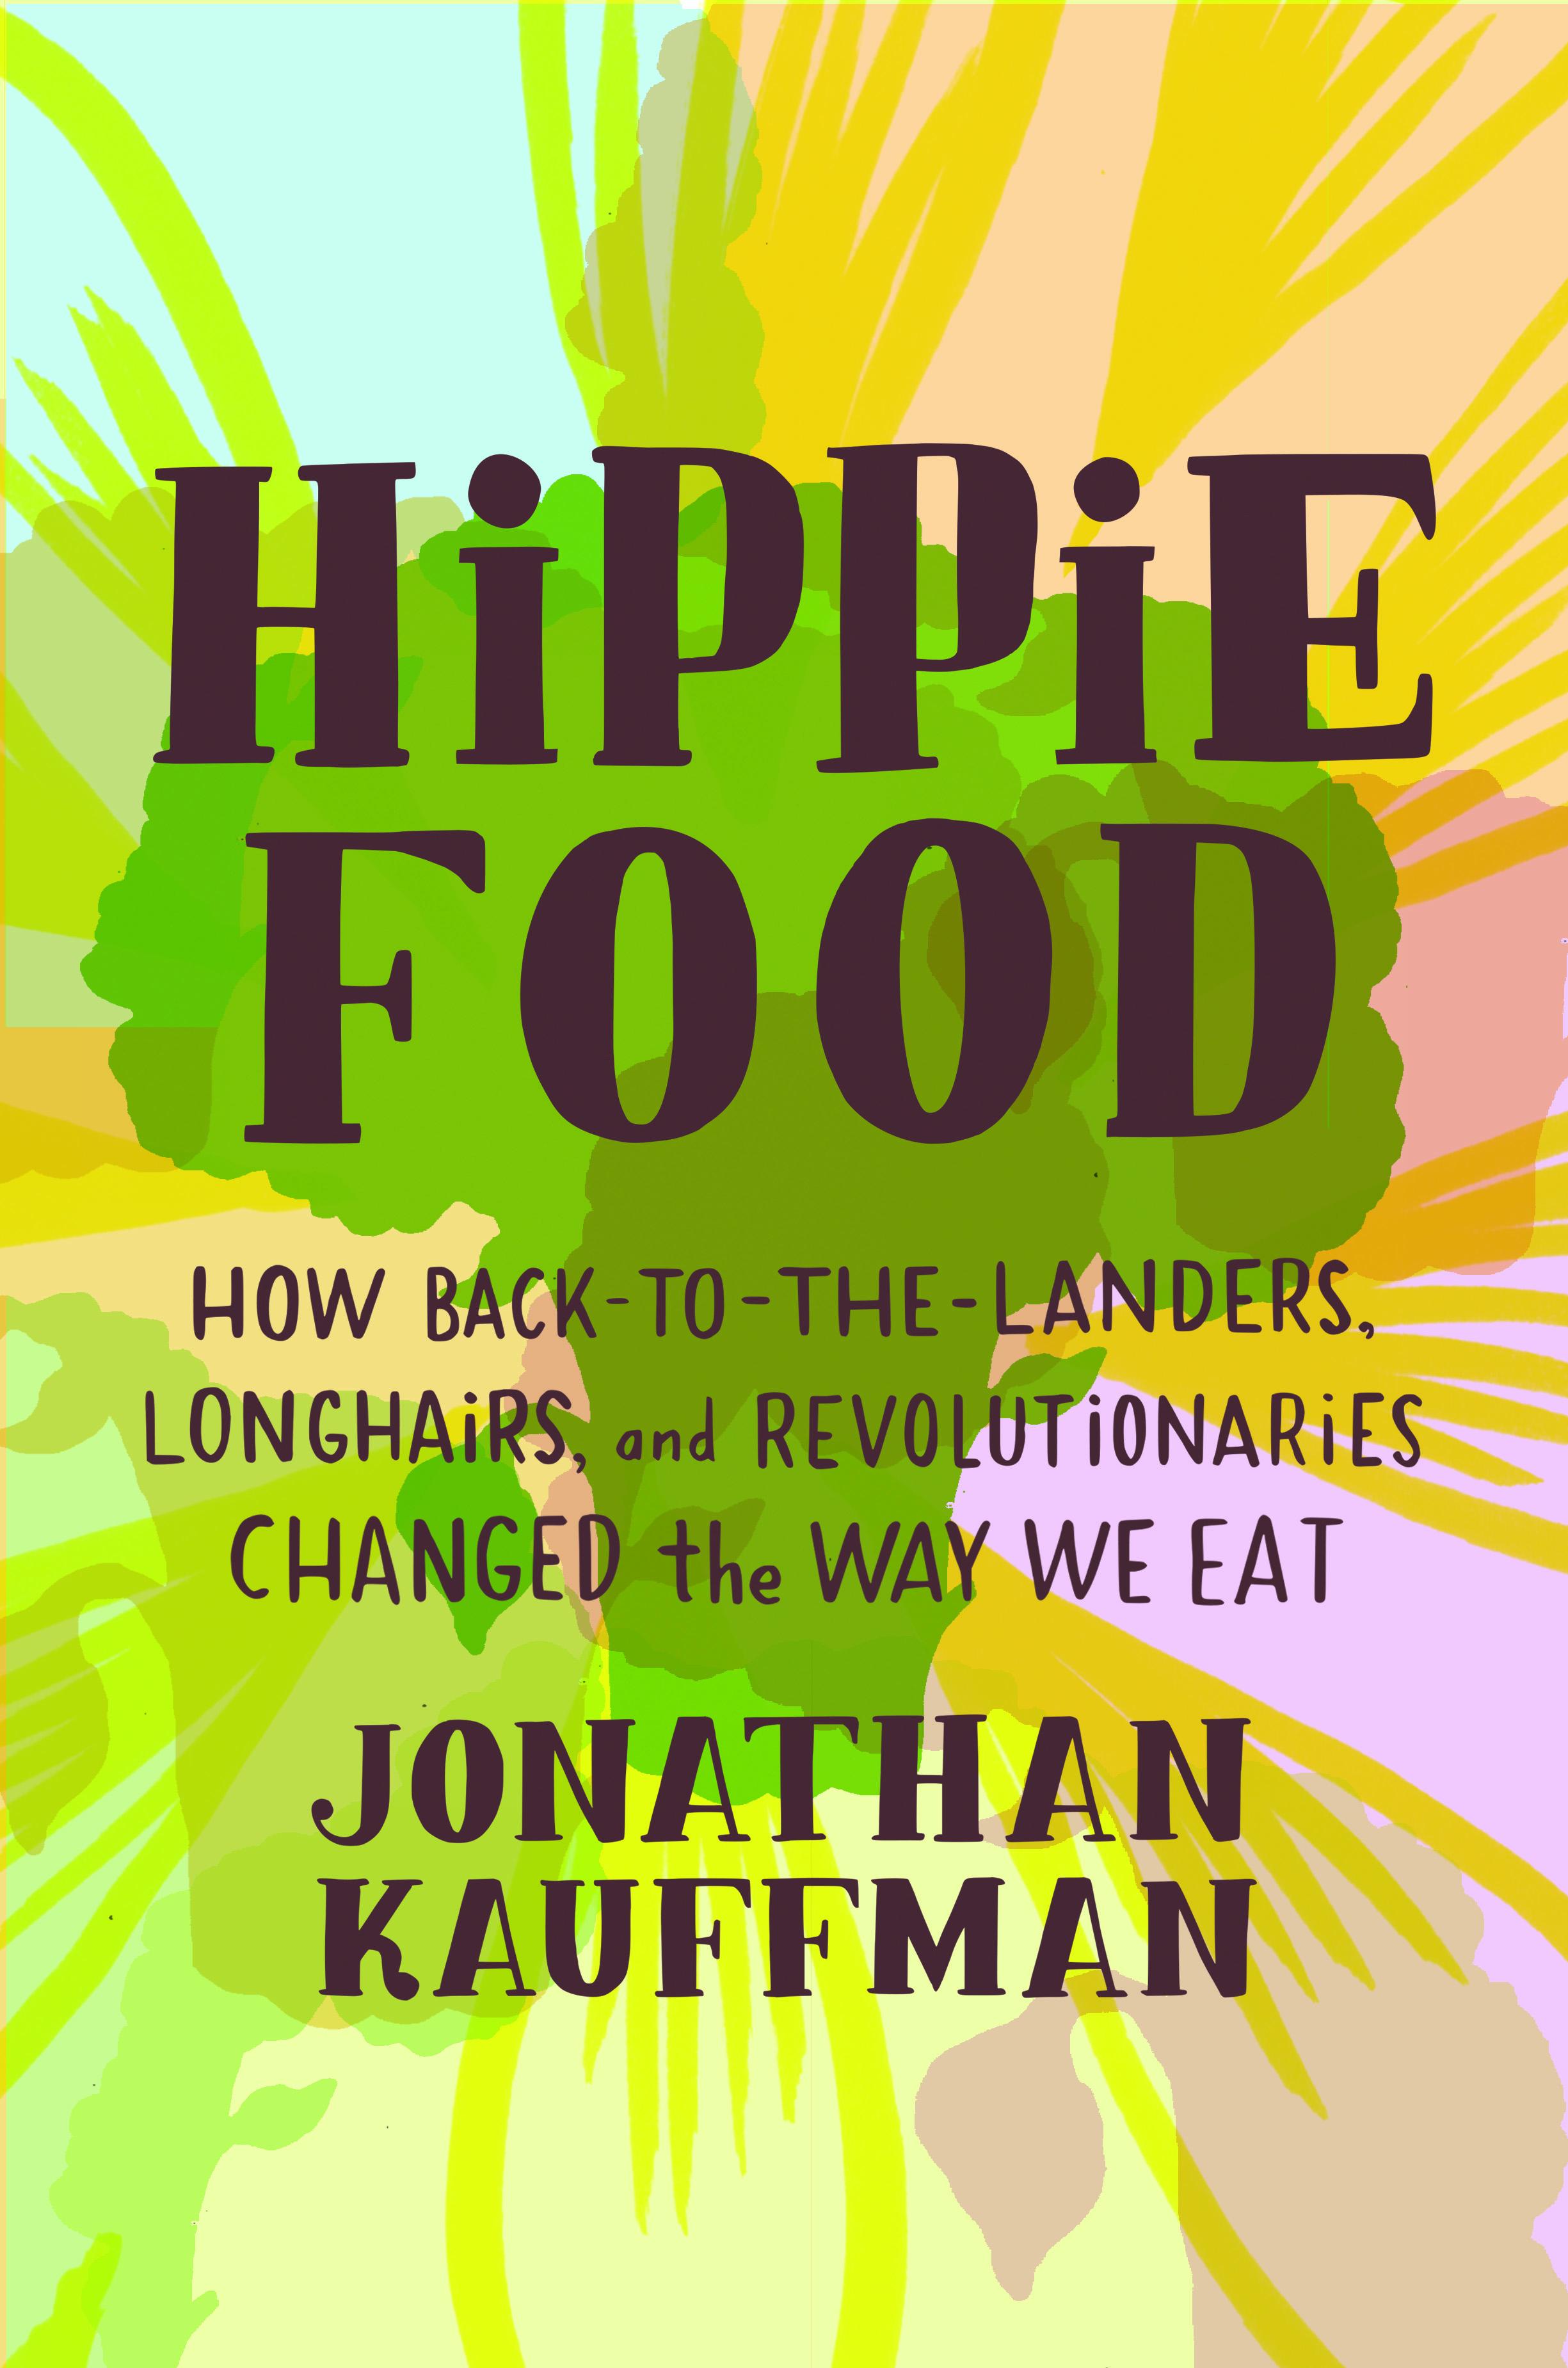 Hippie Food.jpg